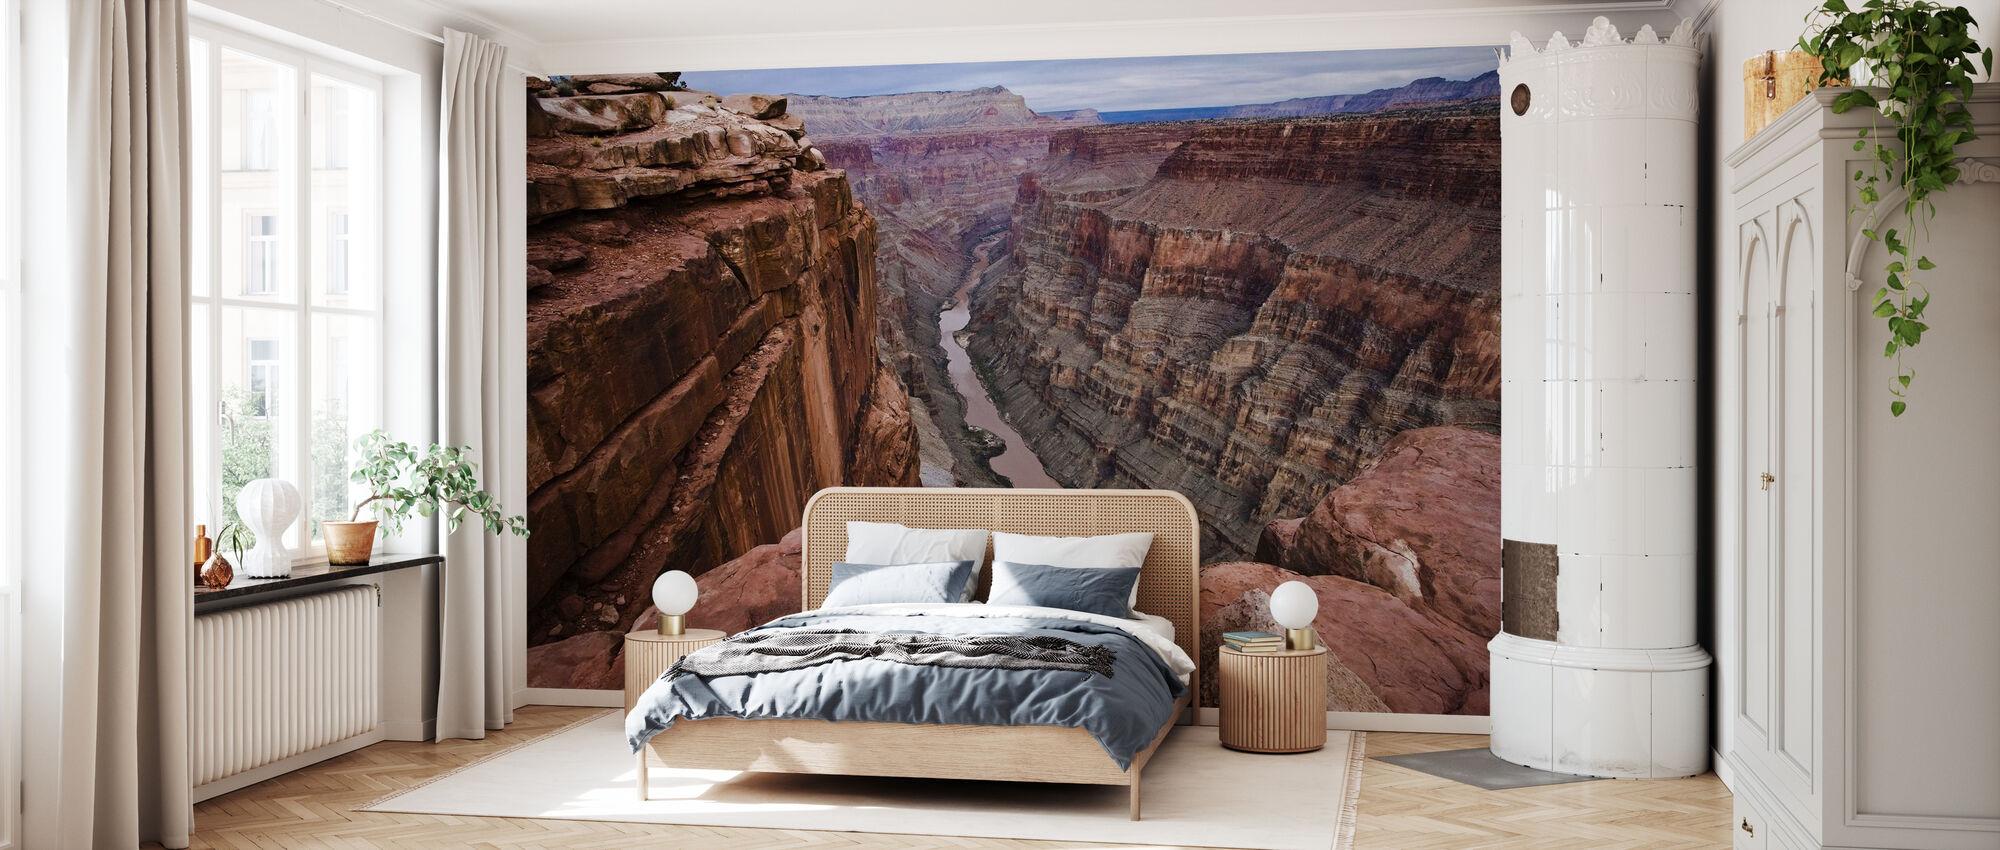 High above the Colorado River - Wallpaper - Bedroom